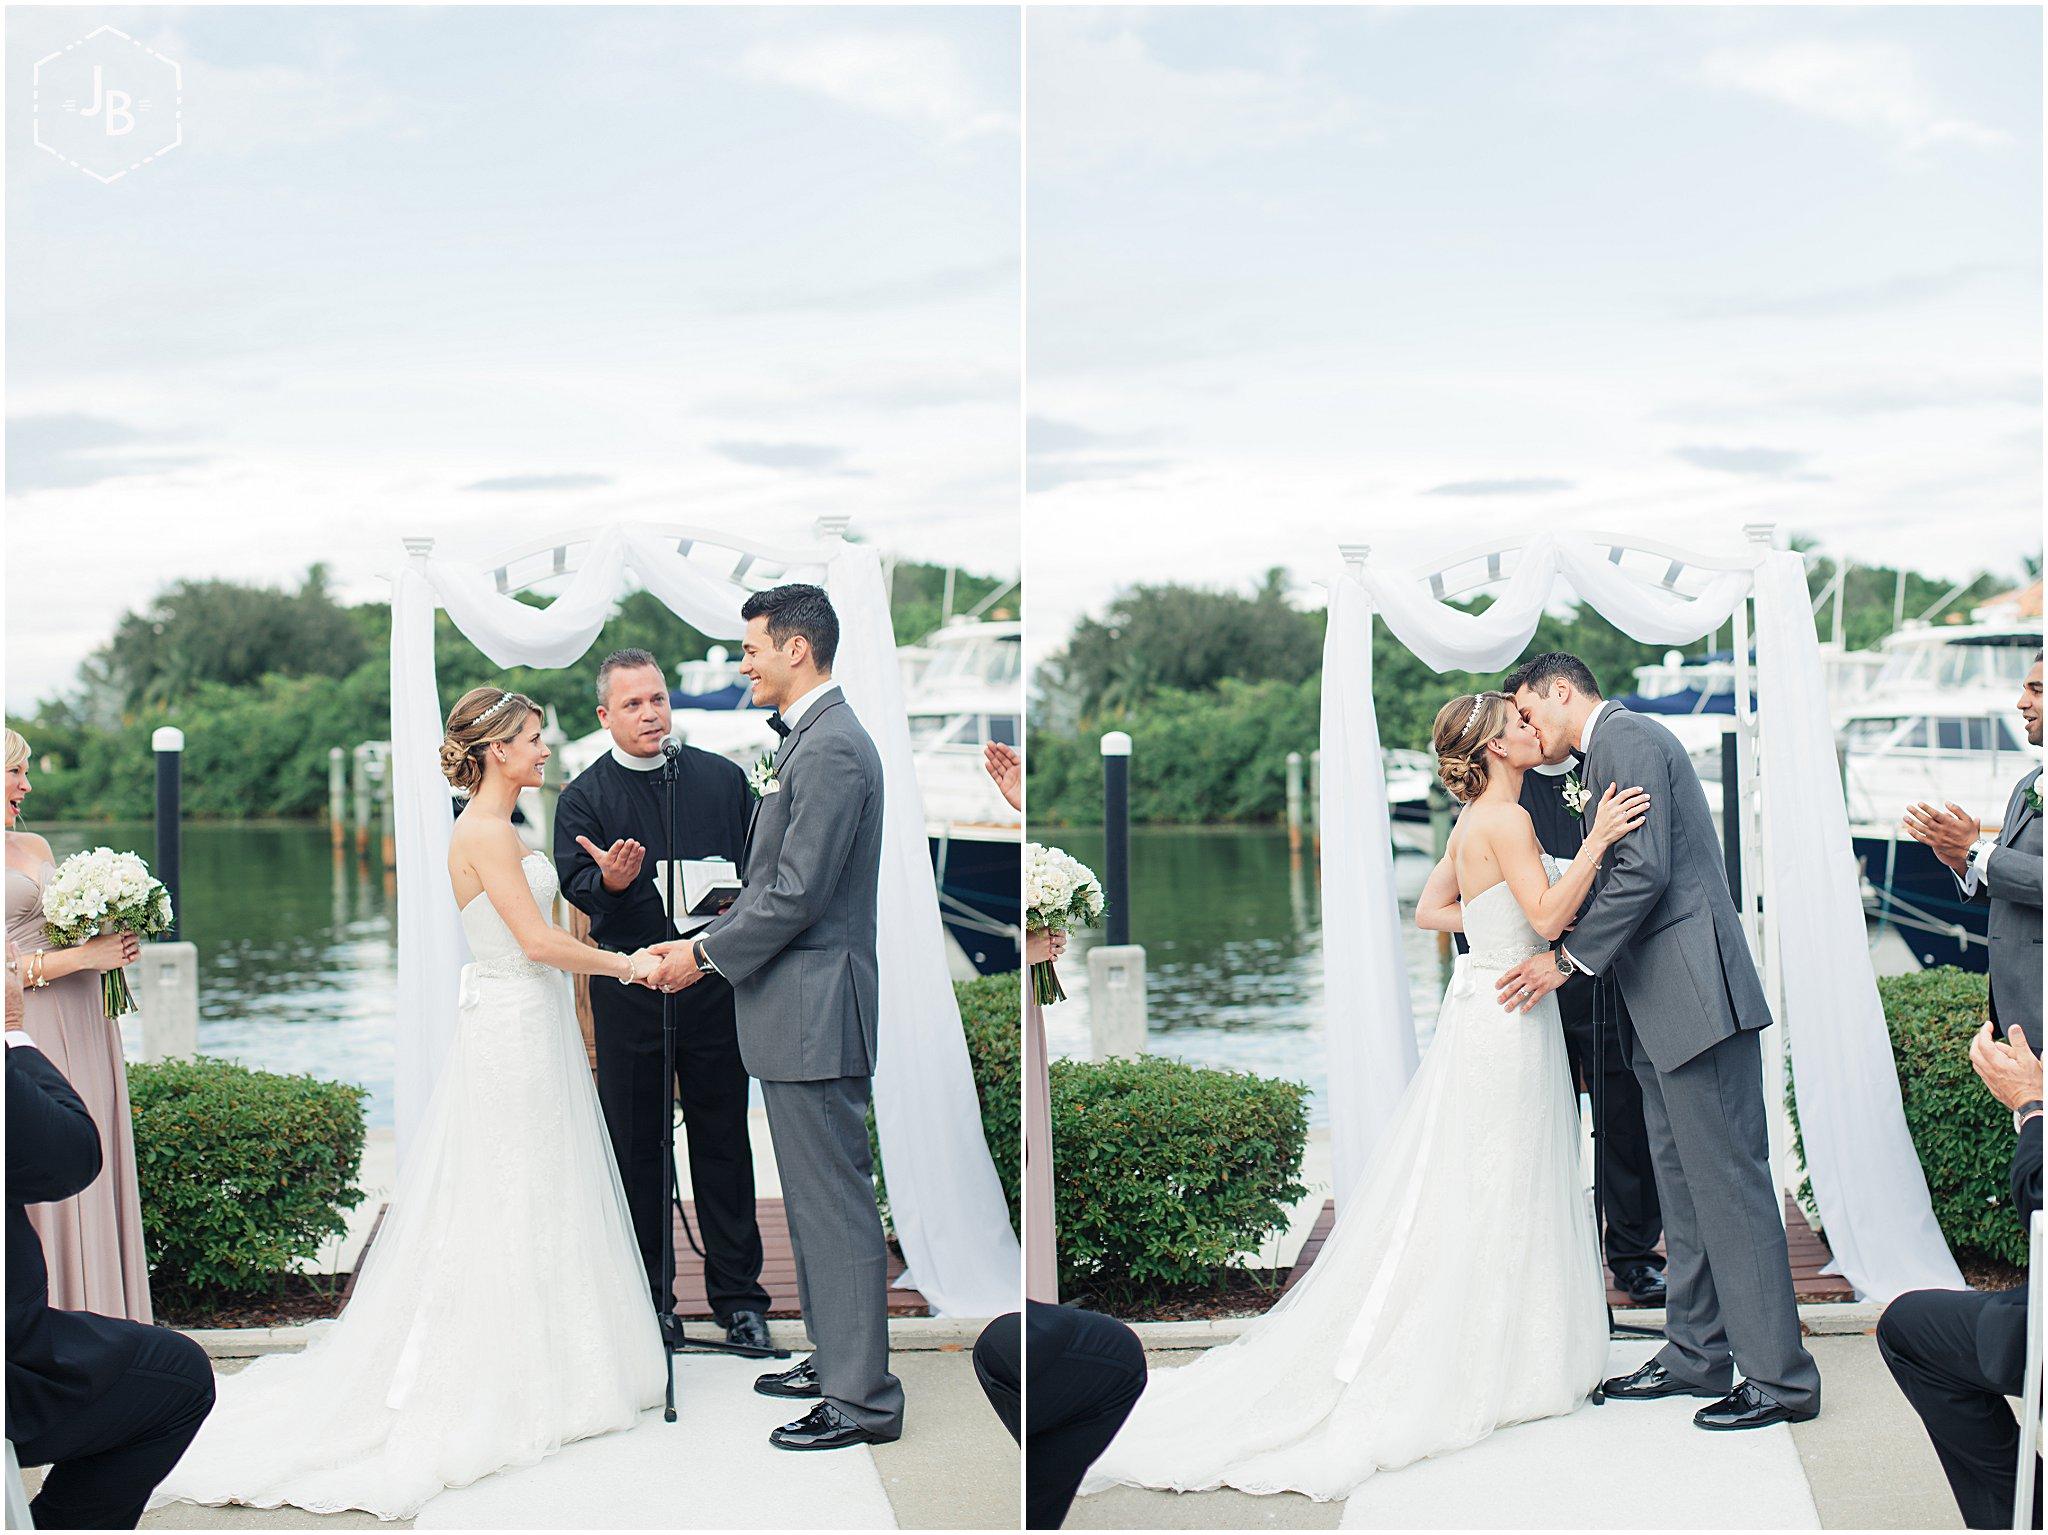 WeddingandEngagementFloridaPhotographer_0355.jpg